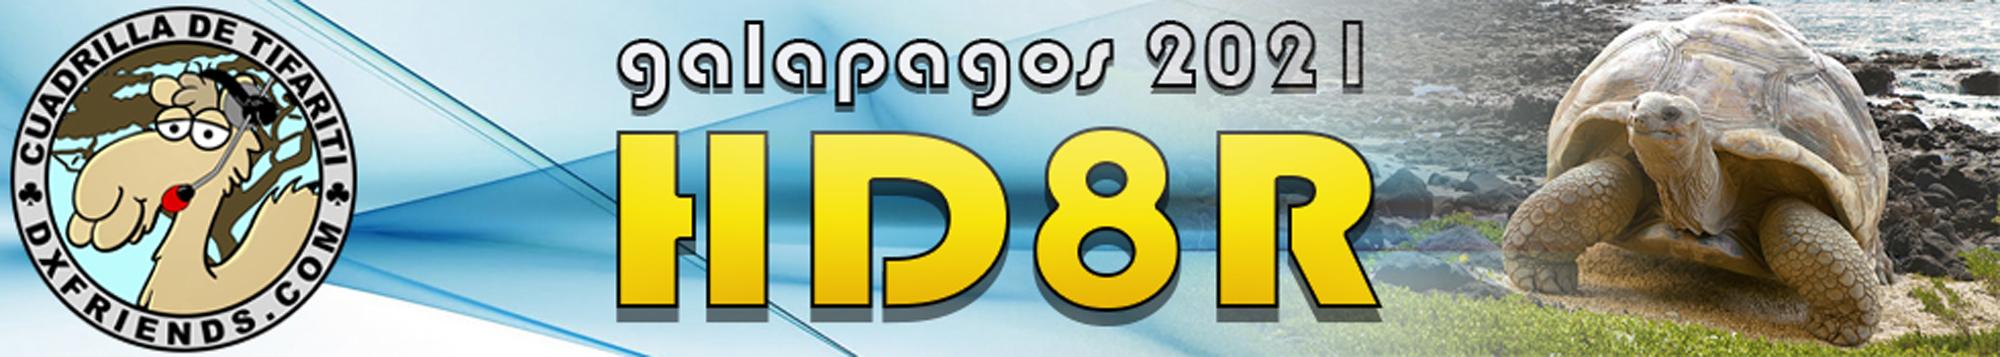 HD8R Galapagos Islands saranno attivi in FT8